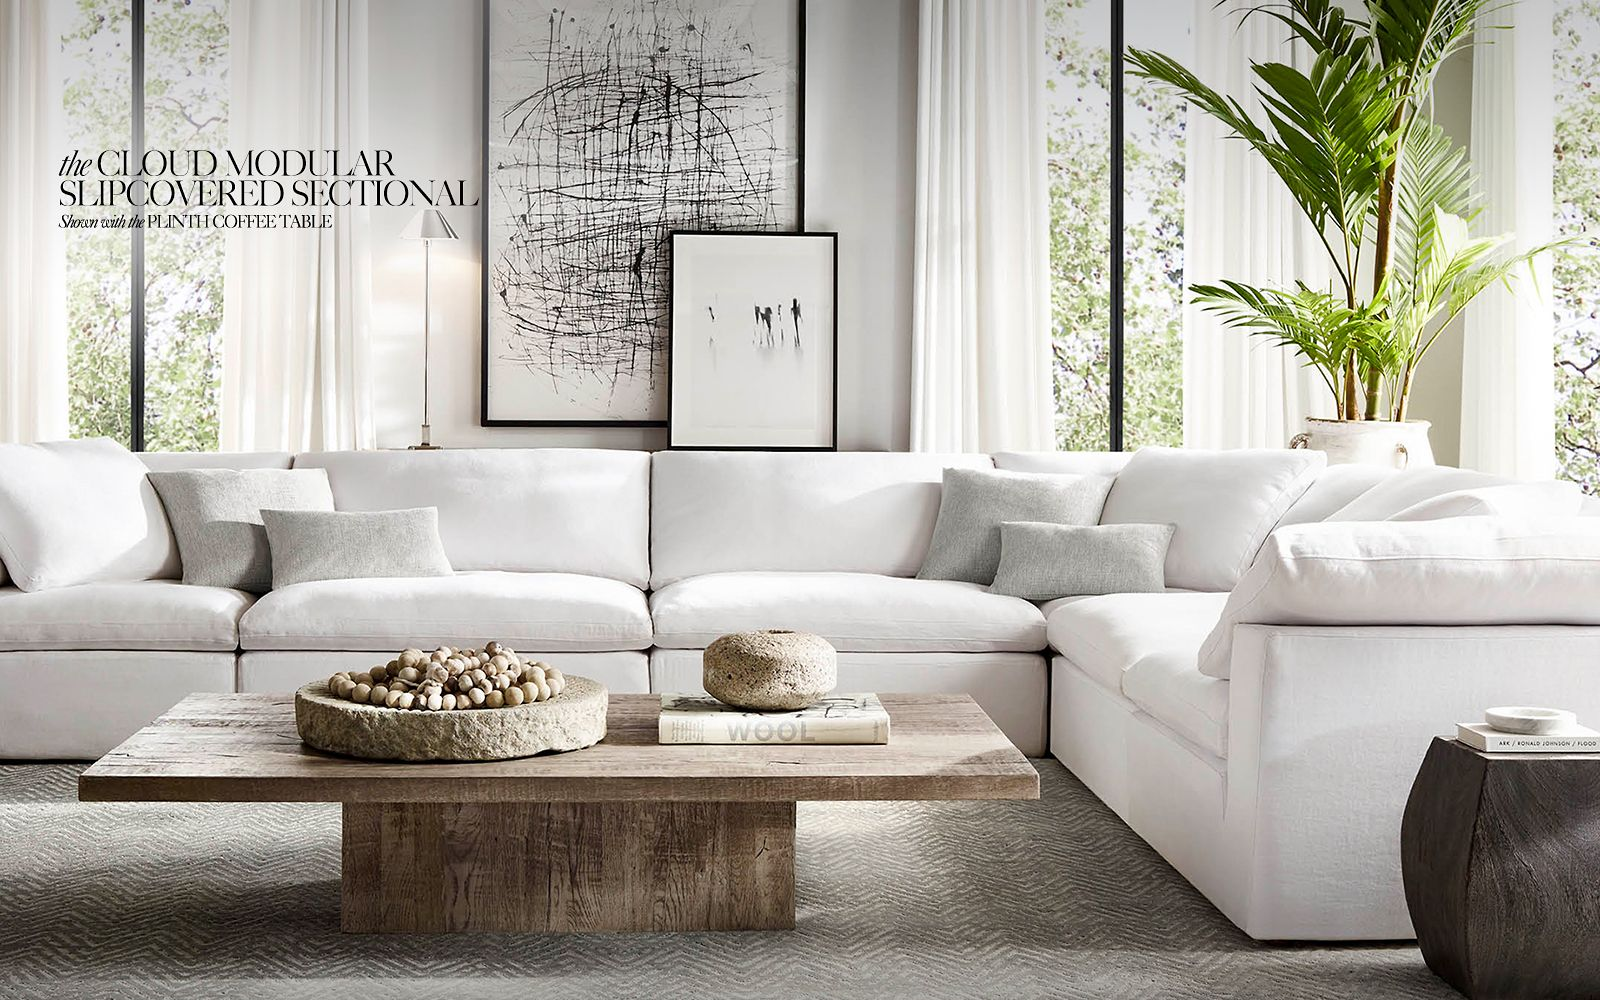 Restoration Hardware Sofa - Fashionista Chicago, Chicago Fashion Blog